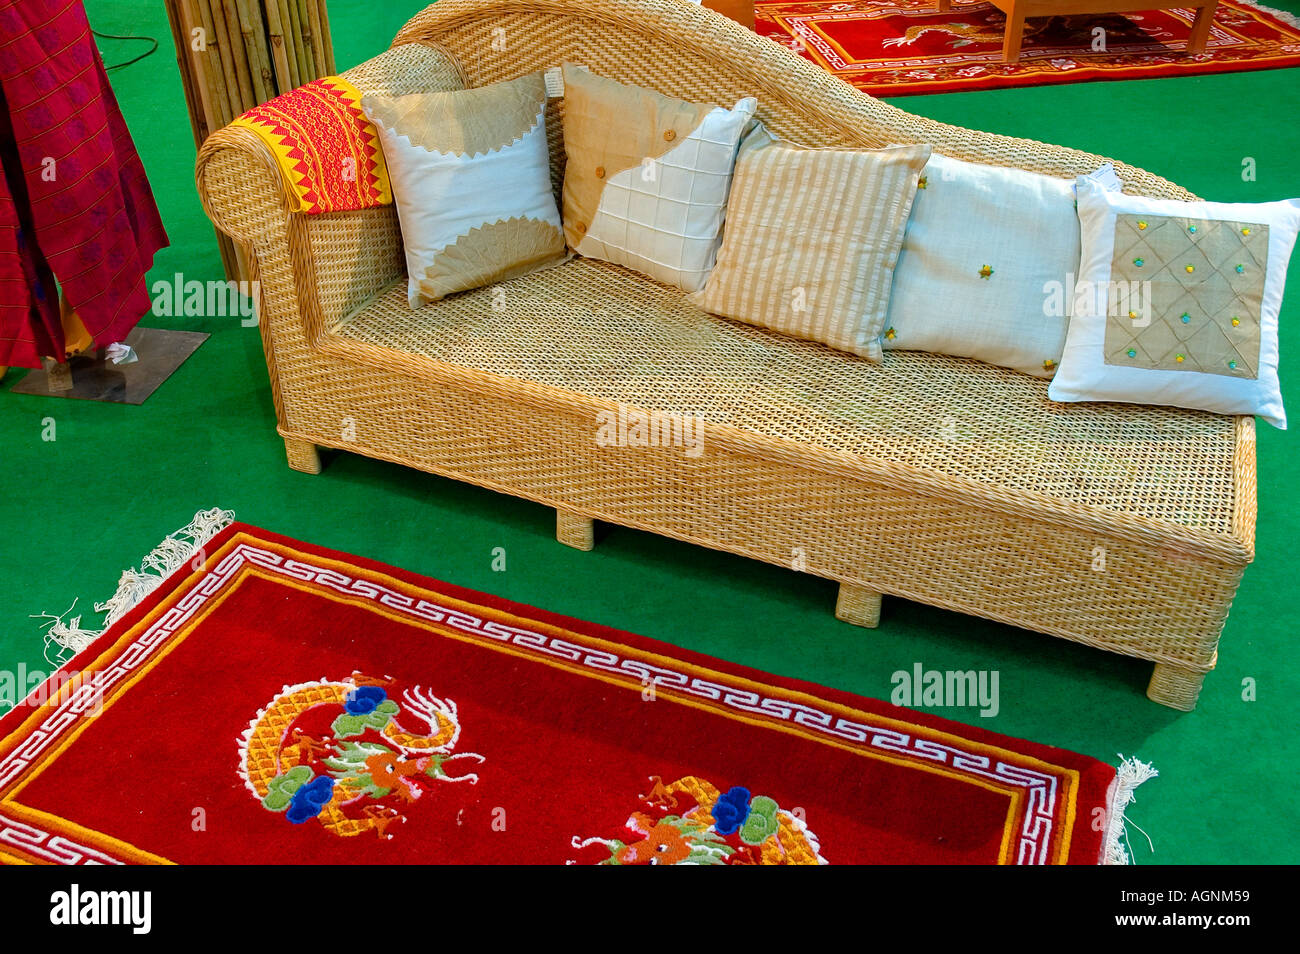 Ethnic Indian Handicrafts U0026 Furniture.   Stock Image